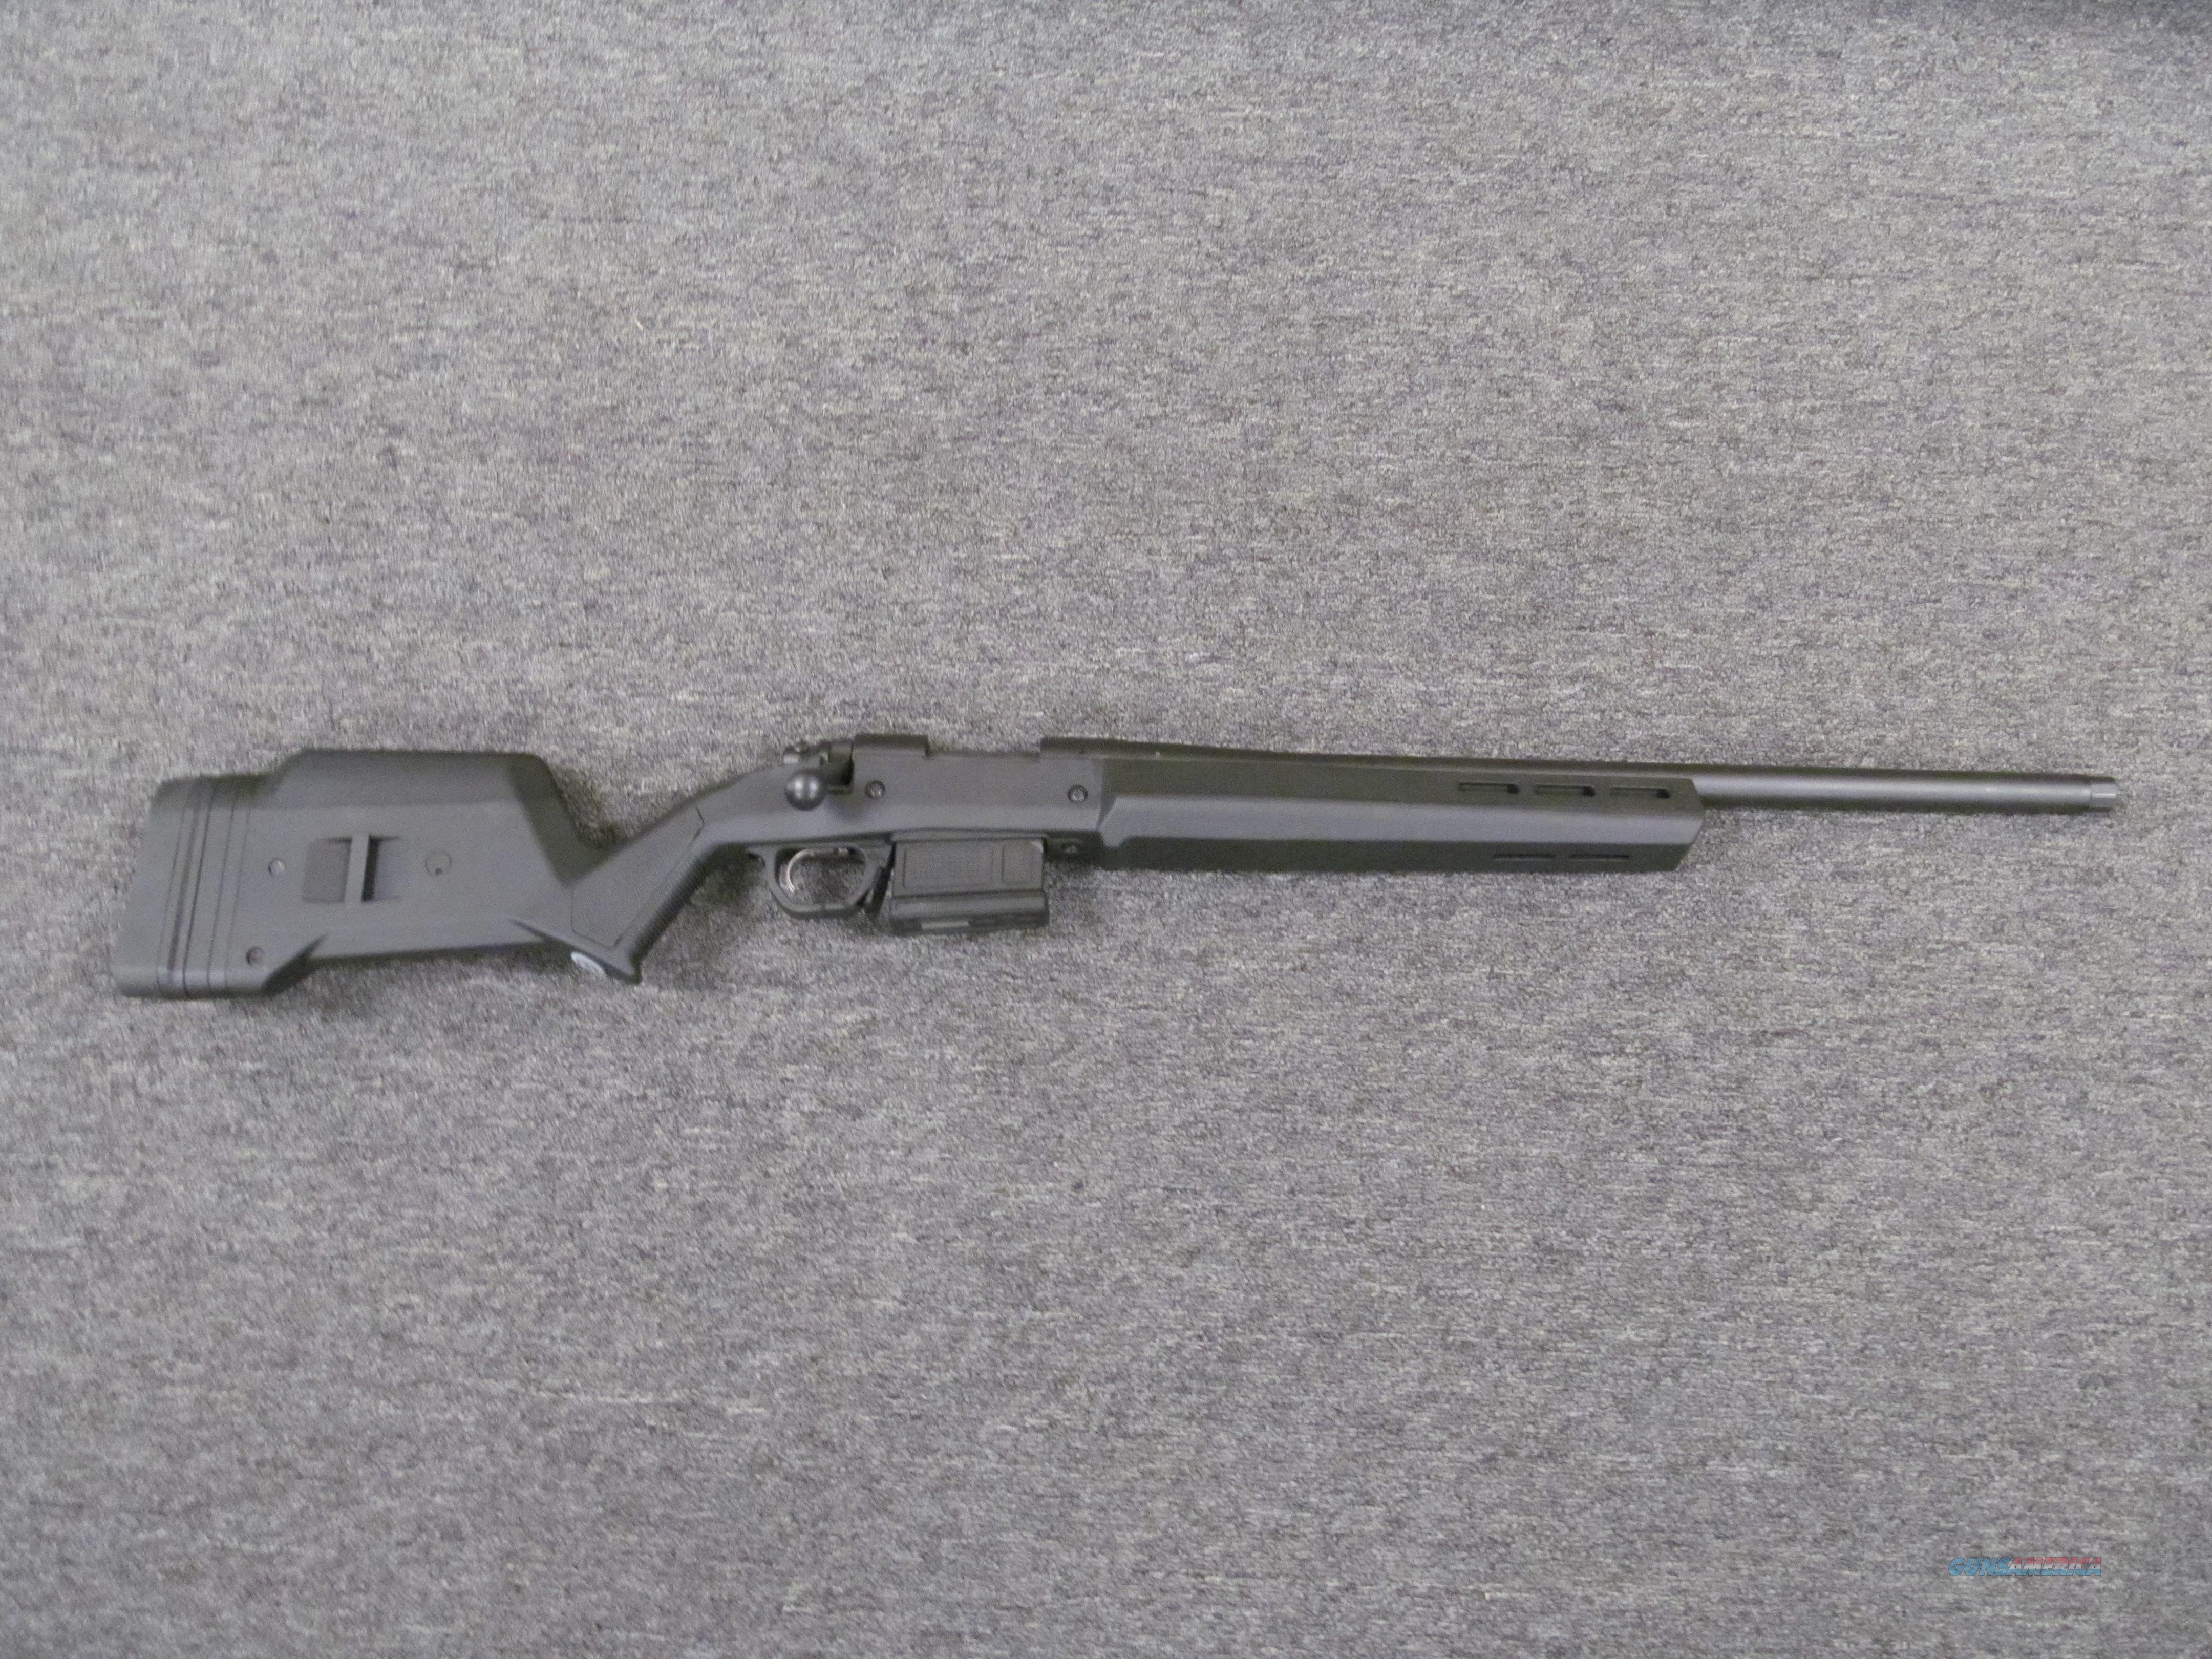 Remington 700 Magpul  Guns > Rifles > Remington Rifles - Modern > Model 700 > Tactical